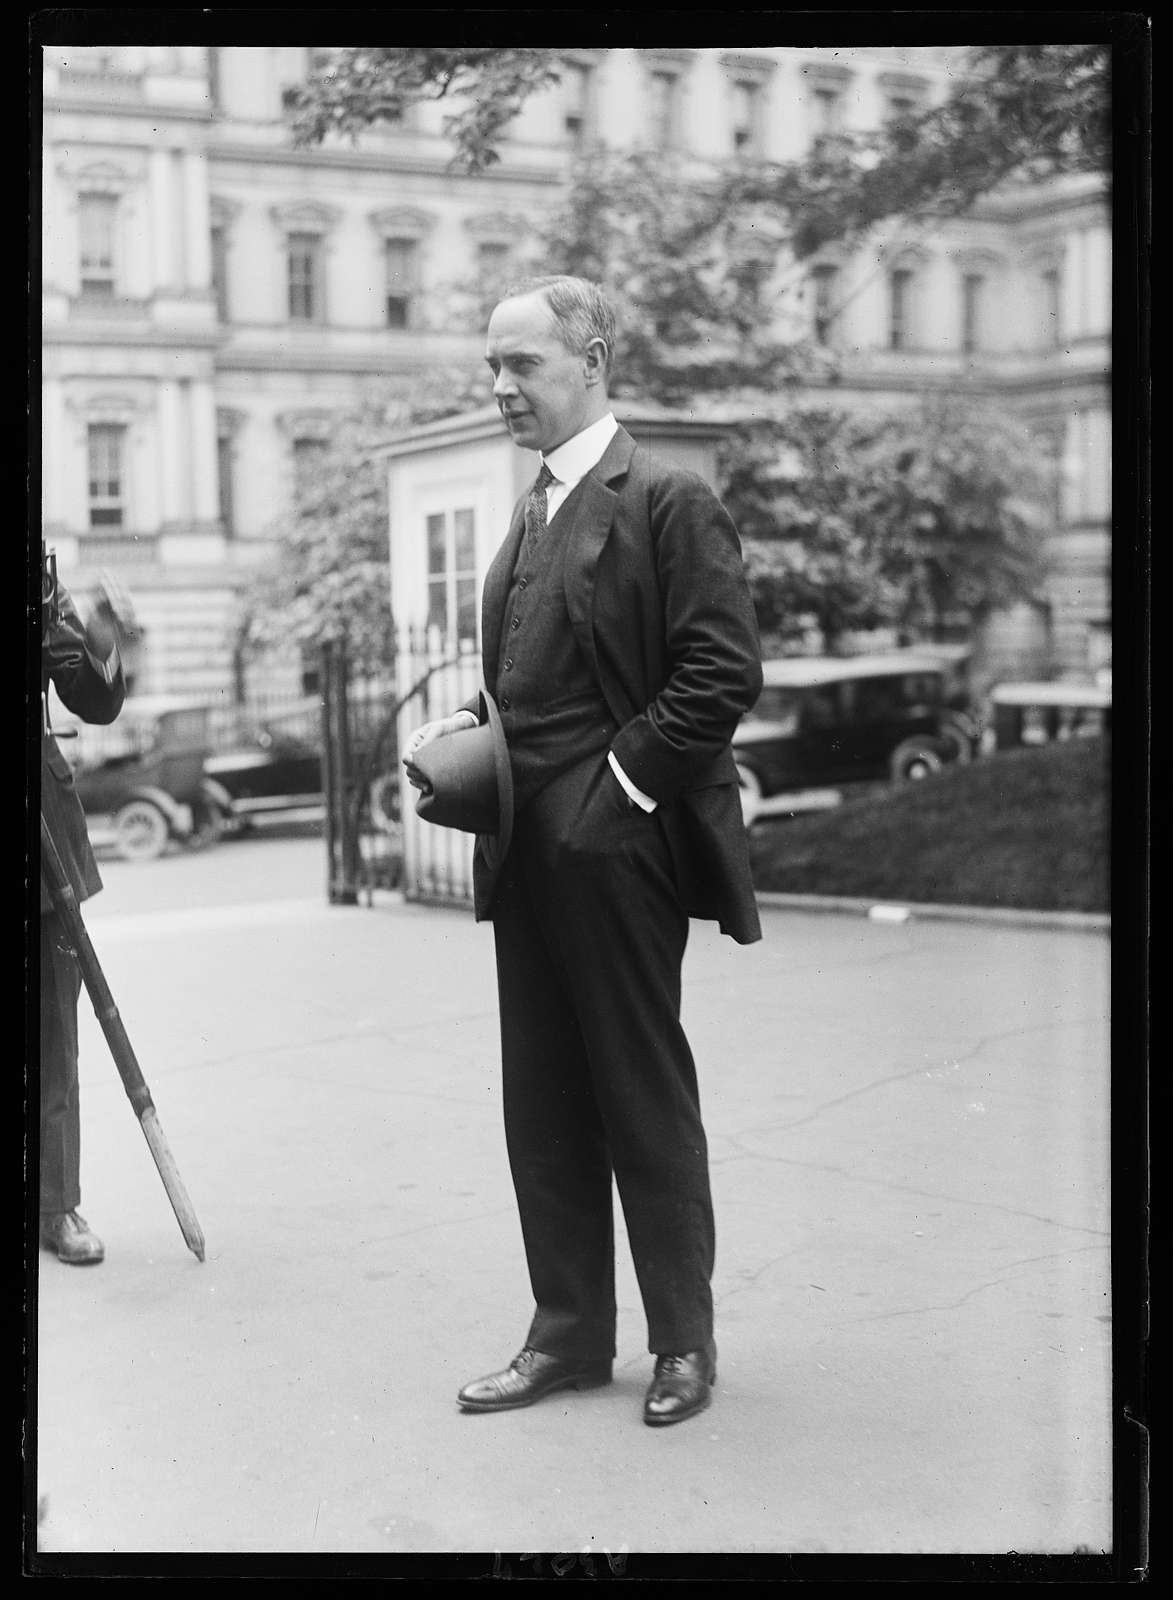 Man at White House, Washington, D.C.